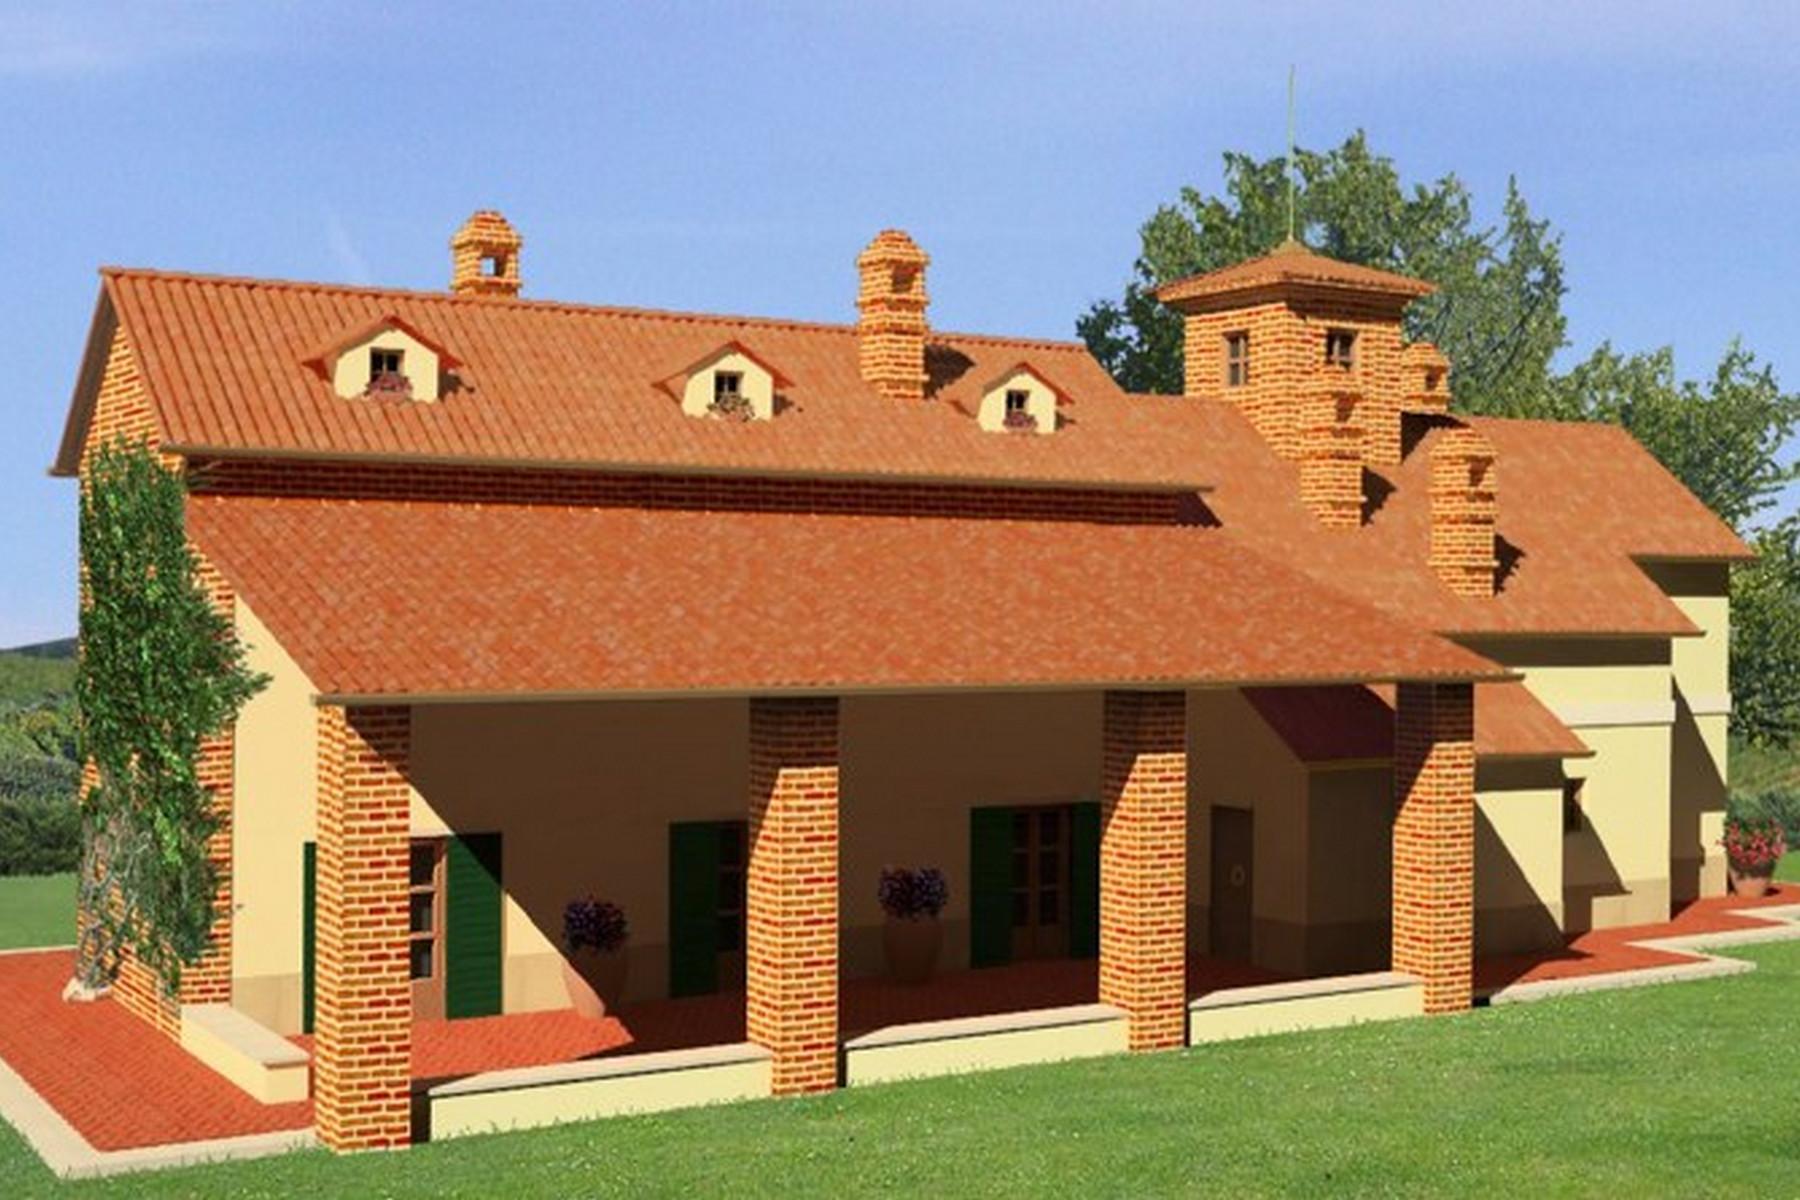 Rustico in Vendita a Novi Ligure: 5 locali, 300 mq - Foto 3